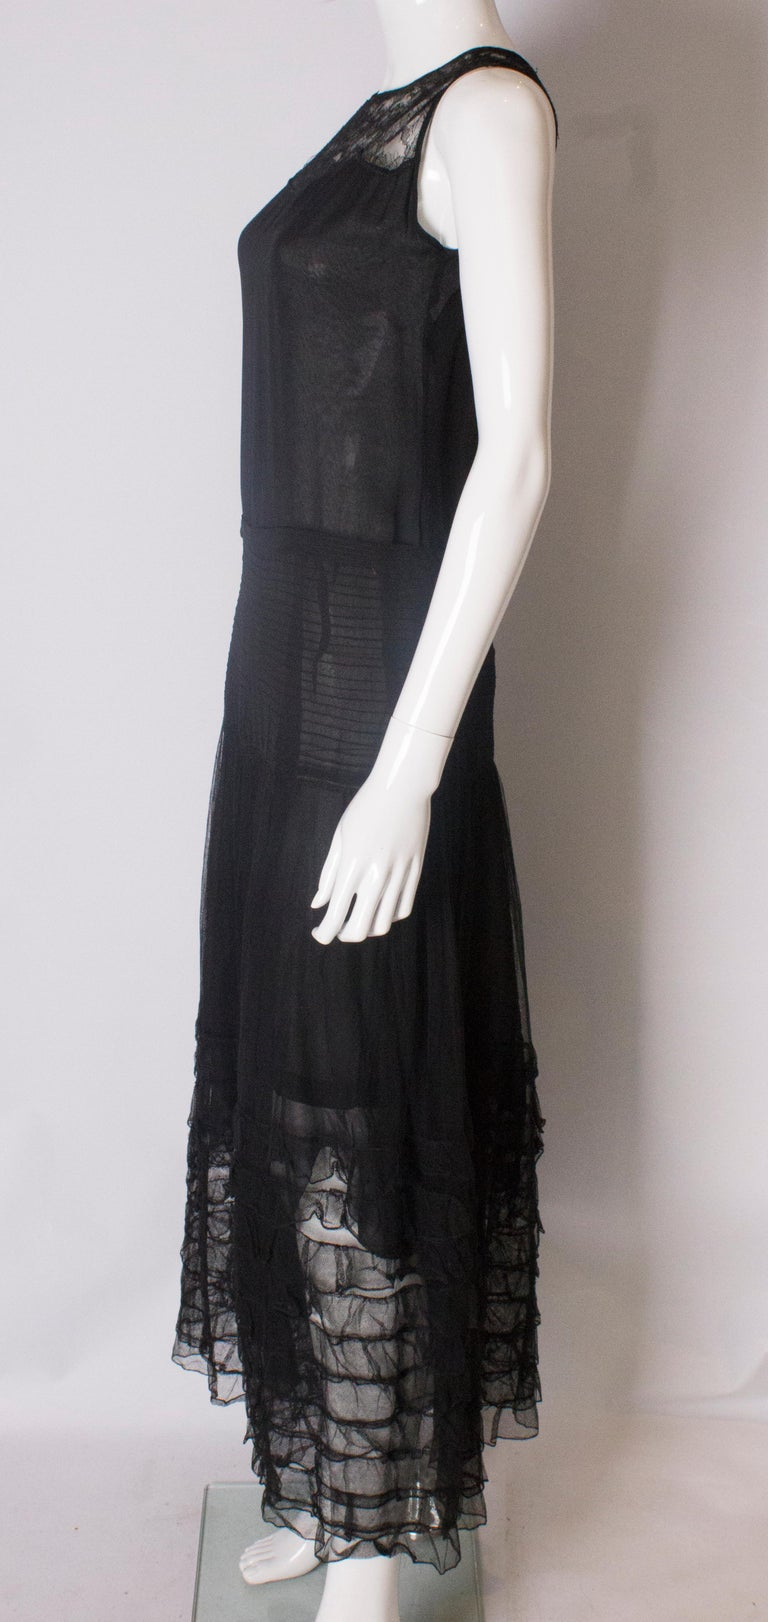 Vintage 1920s Black Evening Gown For Sale at 1stdibs